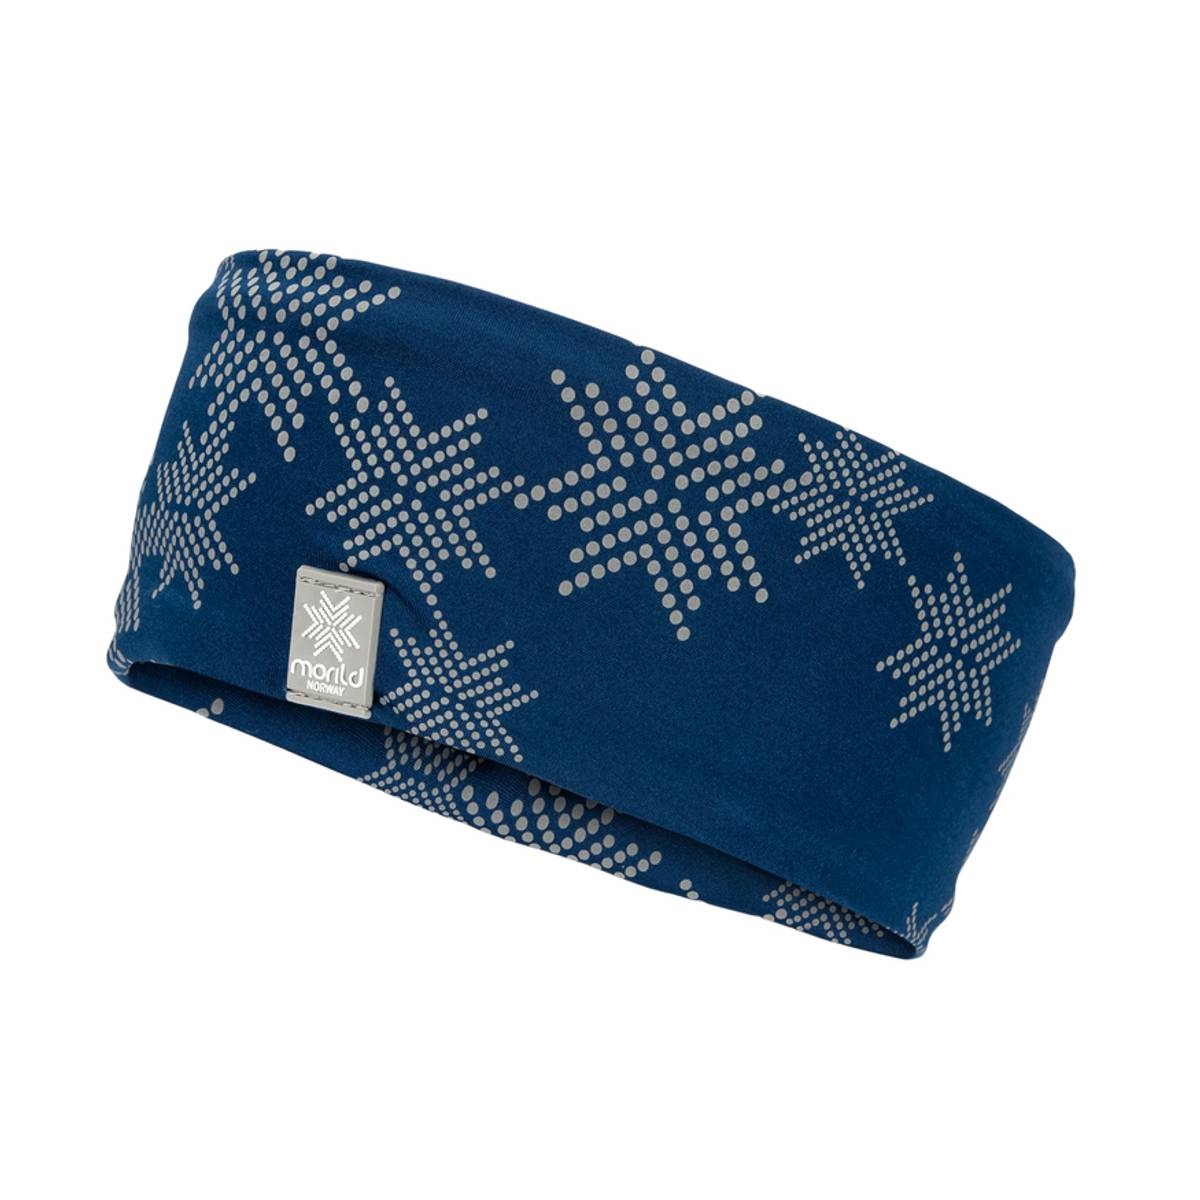 Morild Skimre Junior pannebånd med refleks, marineblå